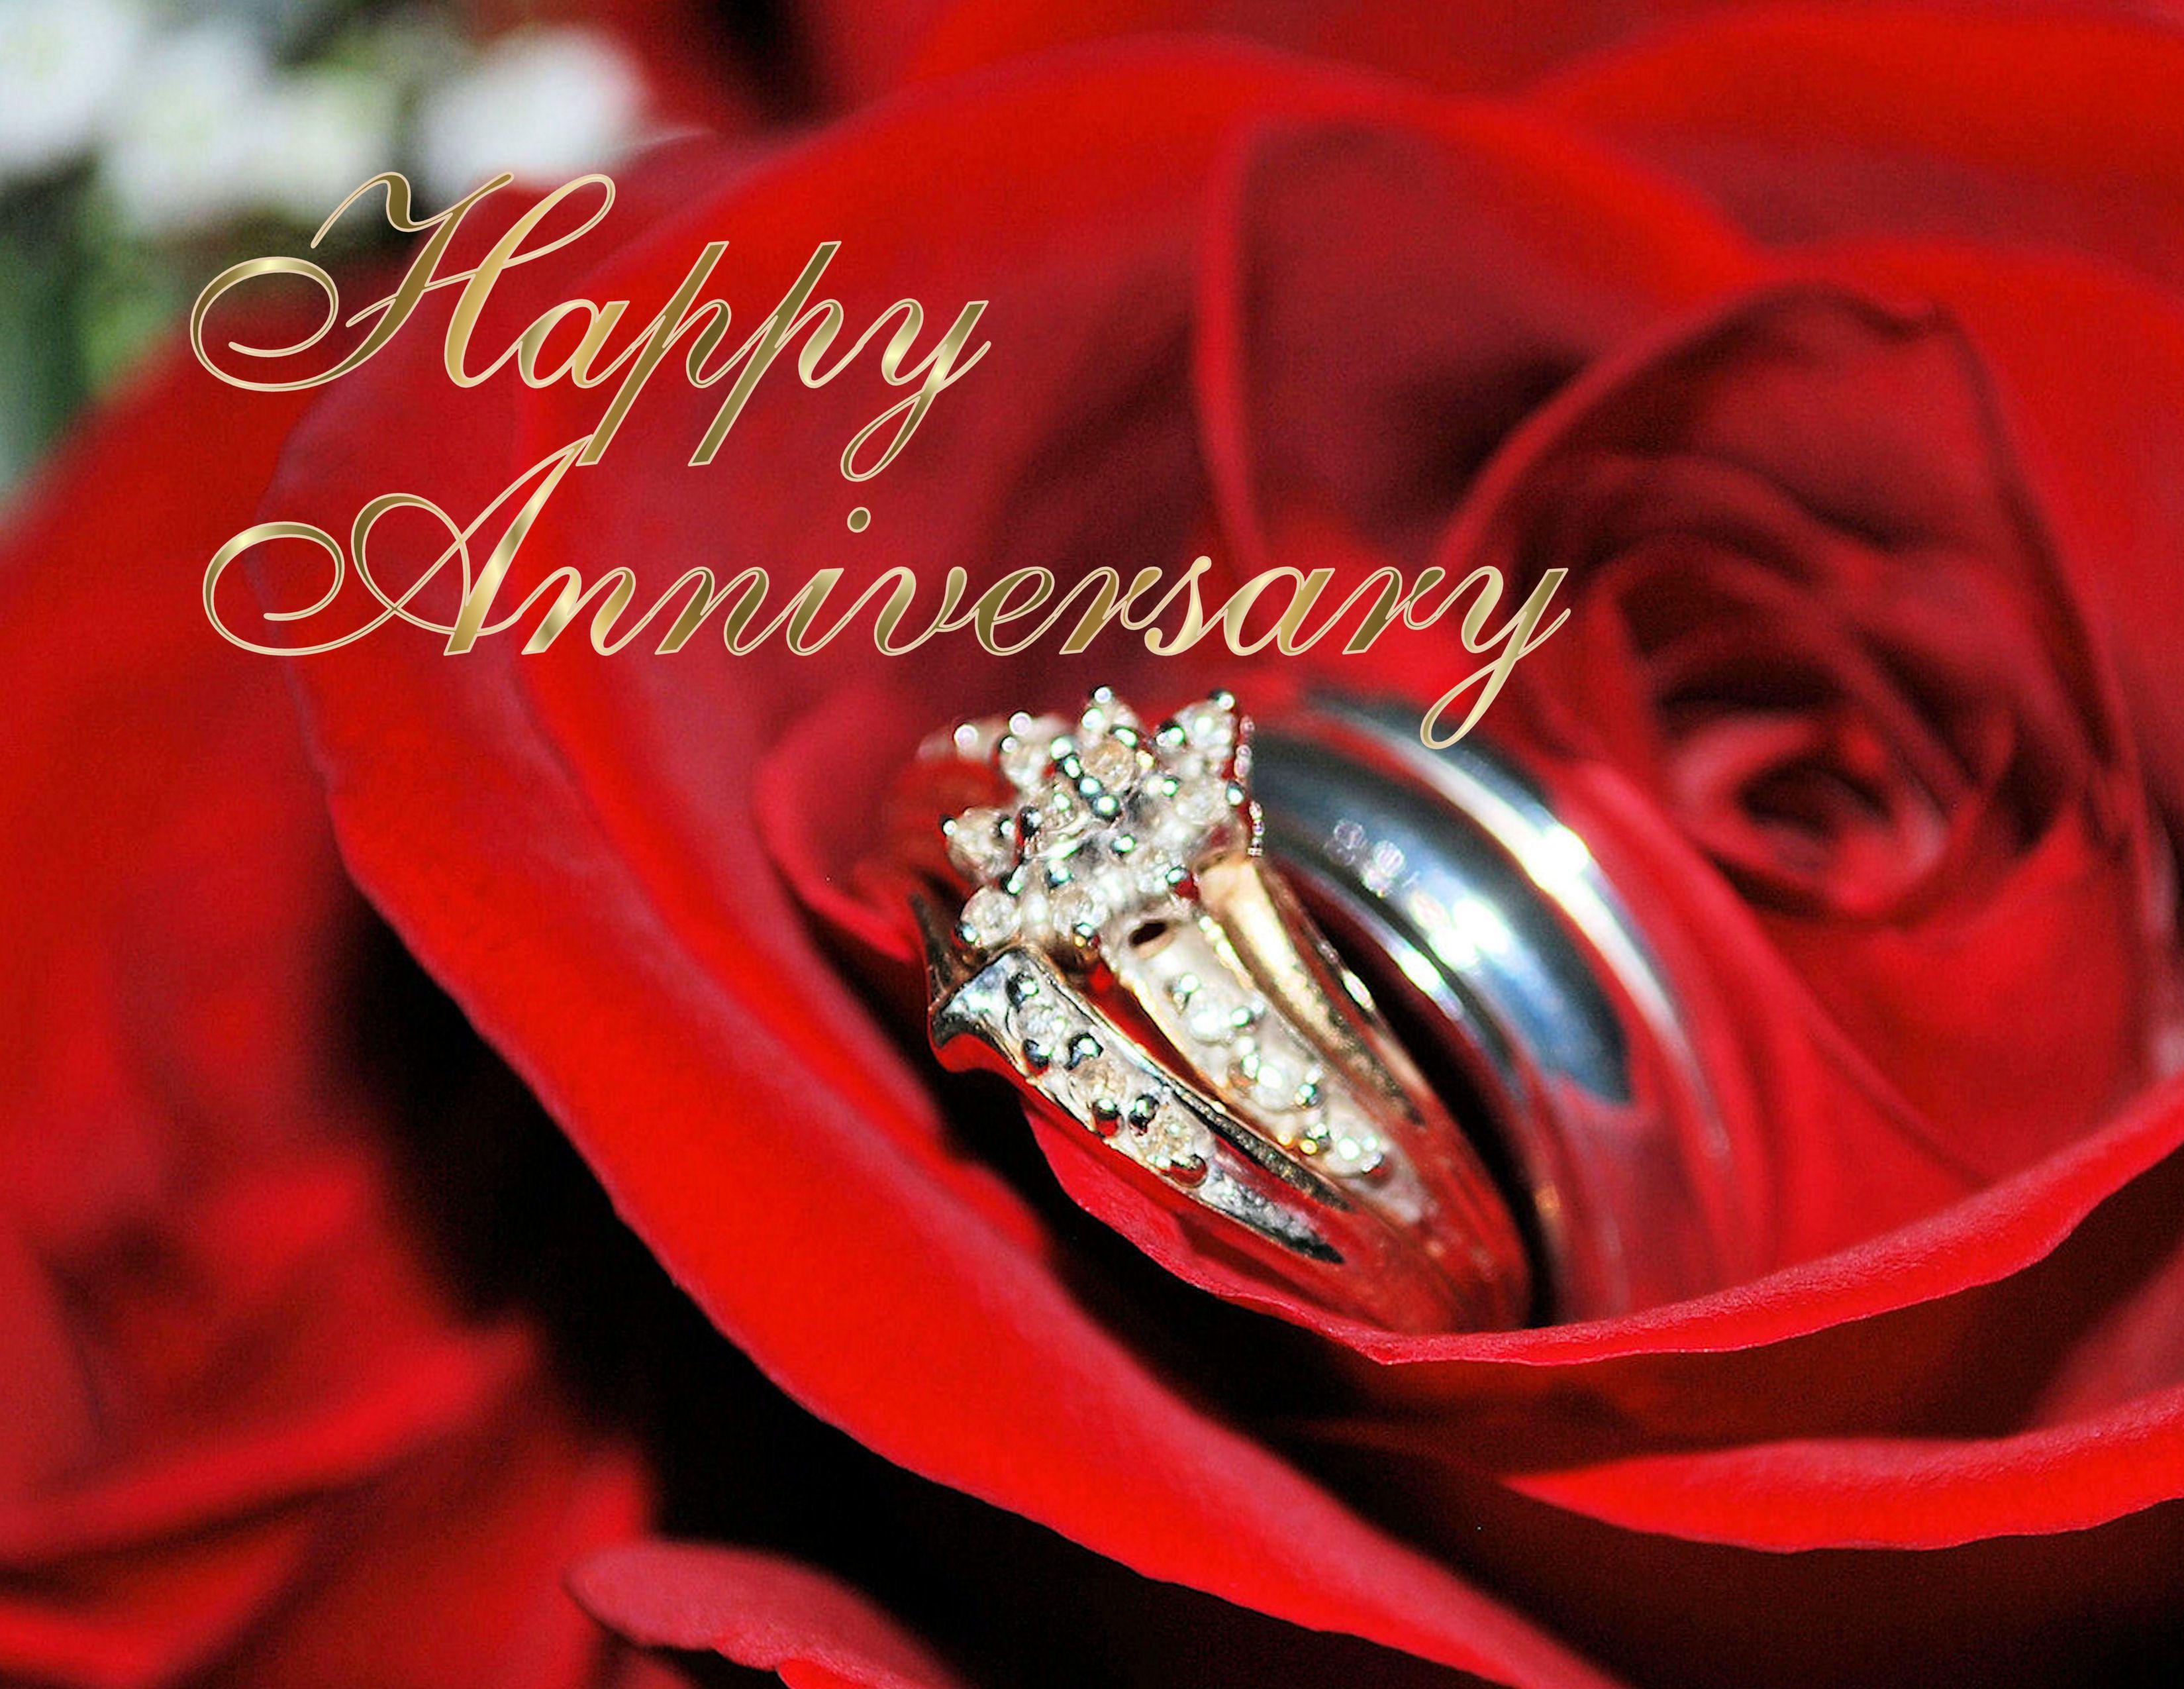 Best wedding wishes images wedding anniversary